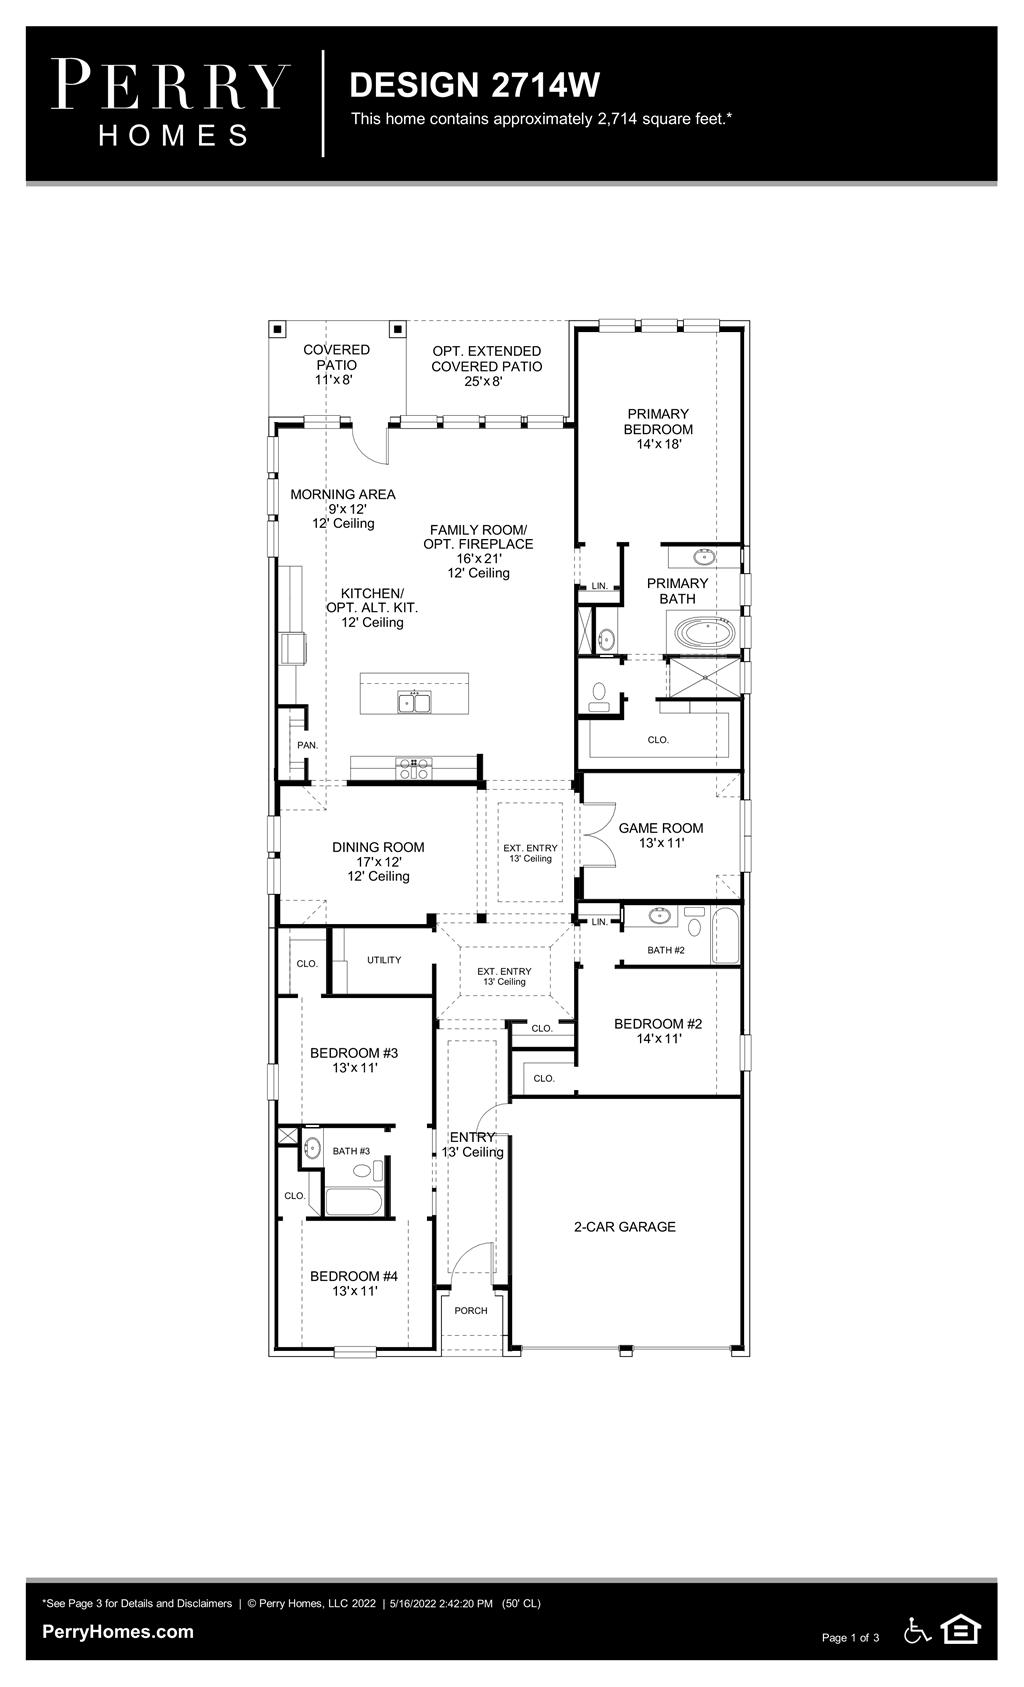 Floor Plan for 2714W